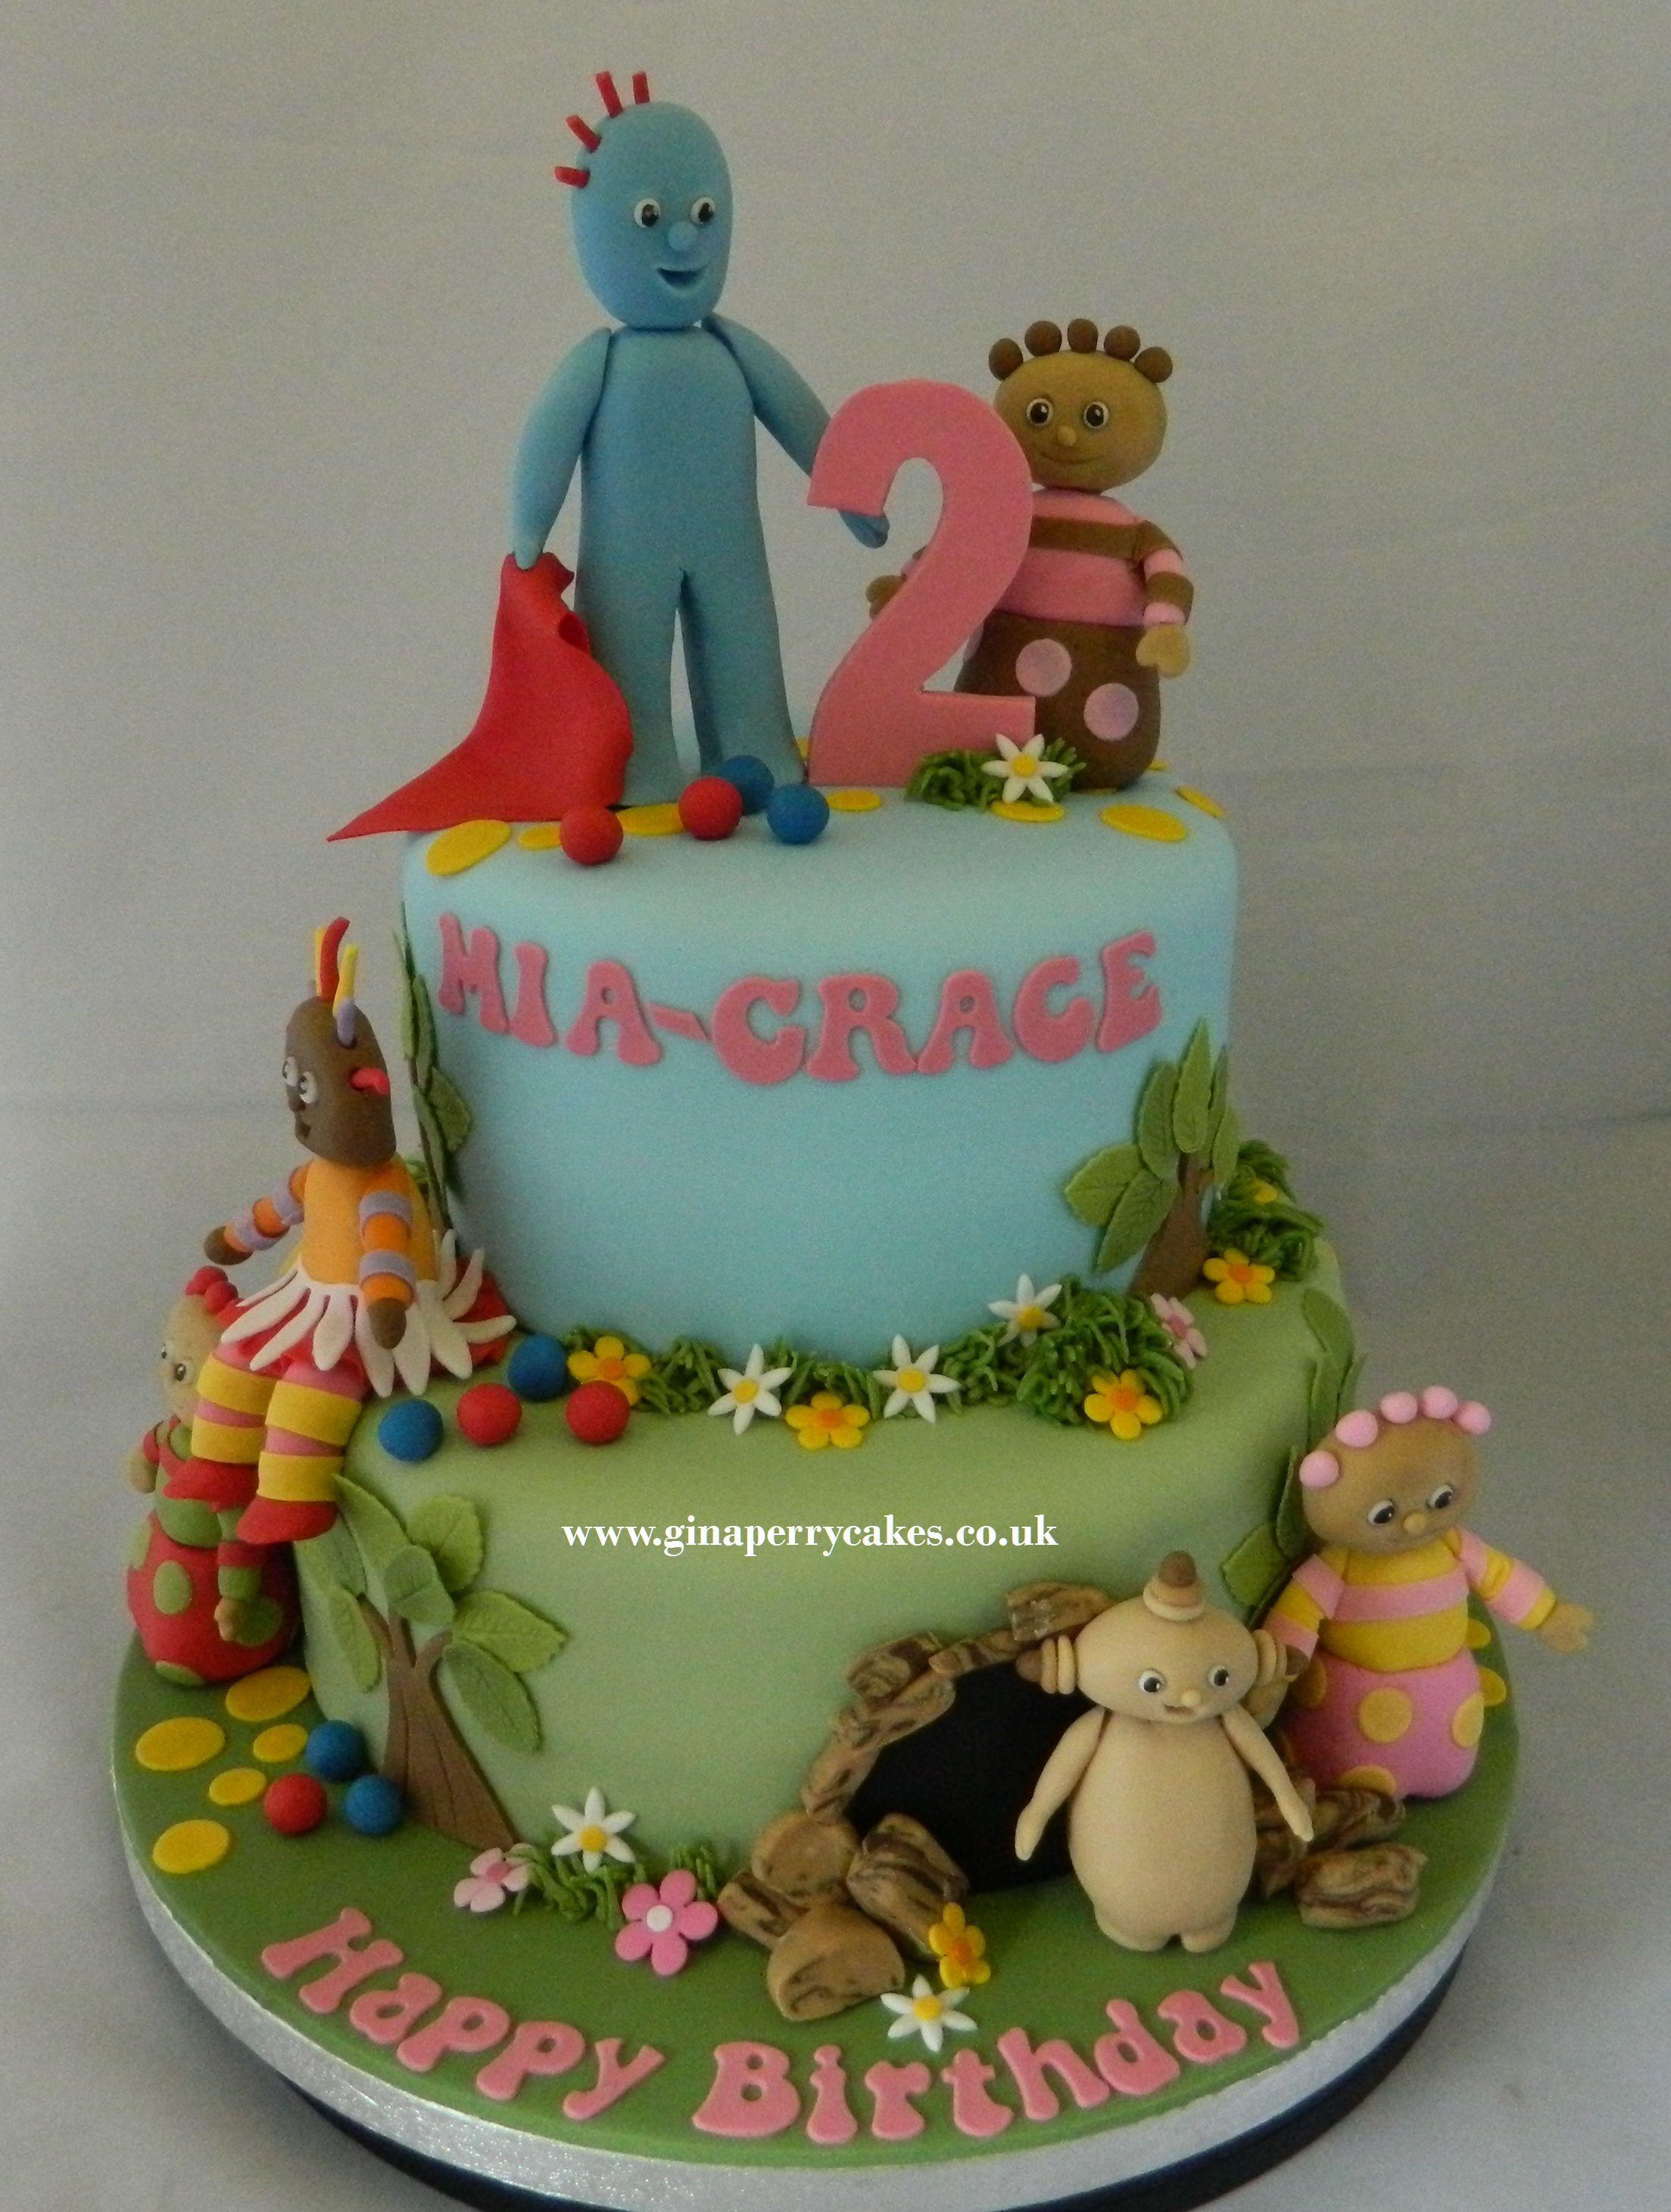 2 year old Birthday cake - In the NIght Garden | My Celebration ...